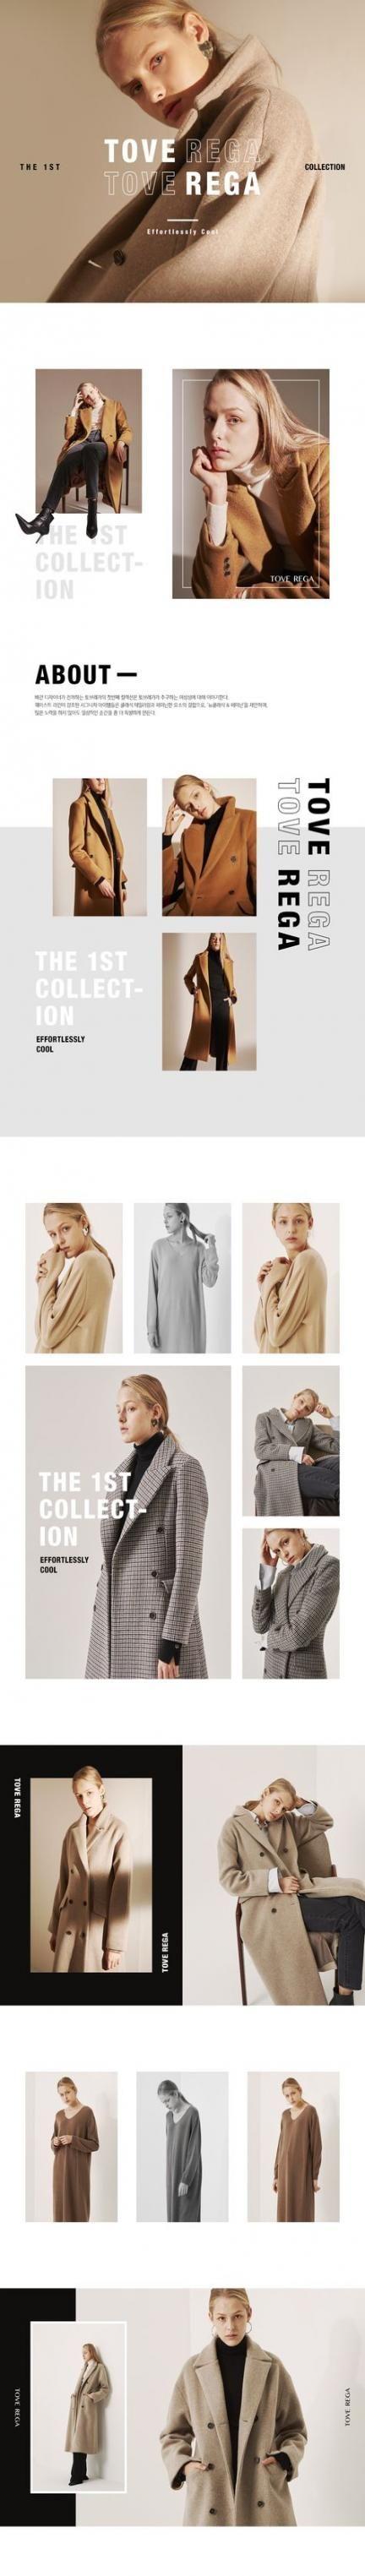 44 trendy Ideas fashion editorial layout creative ideas #editoriallayout